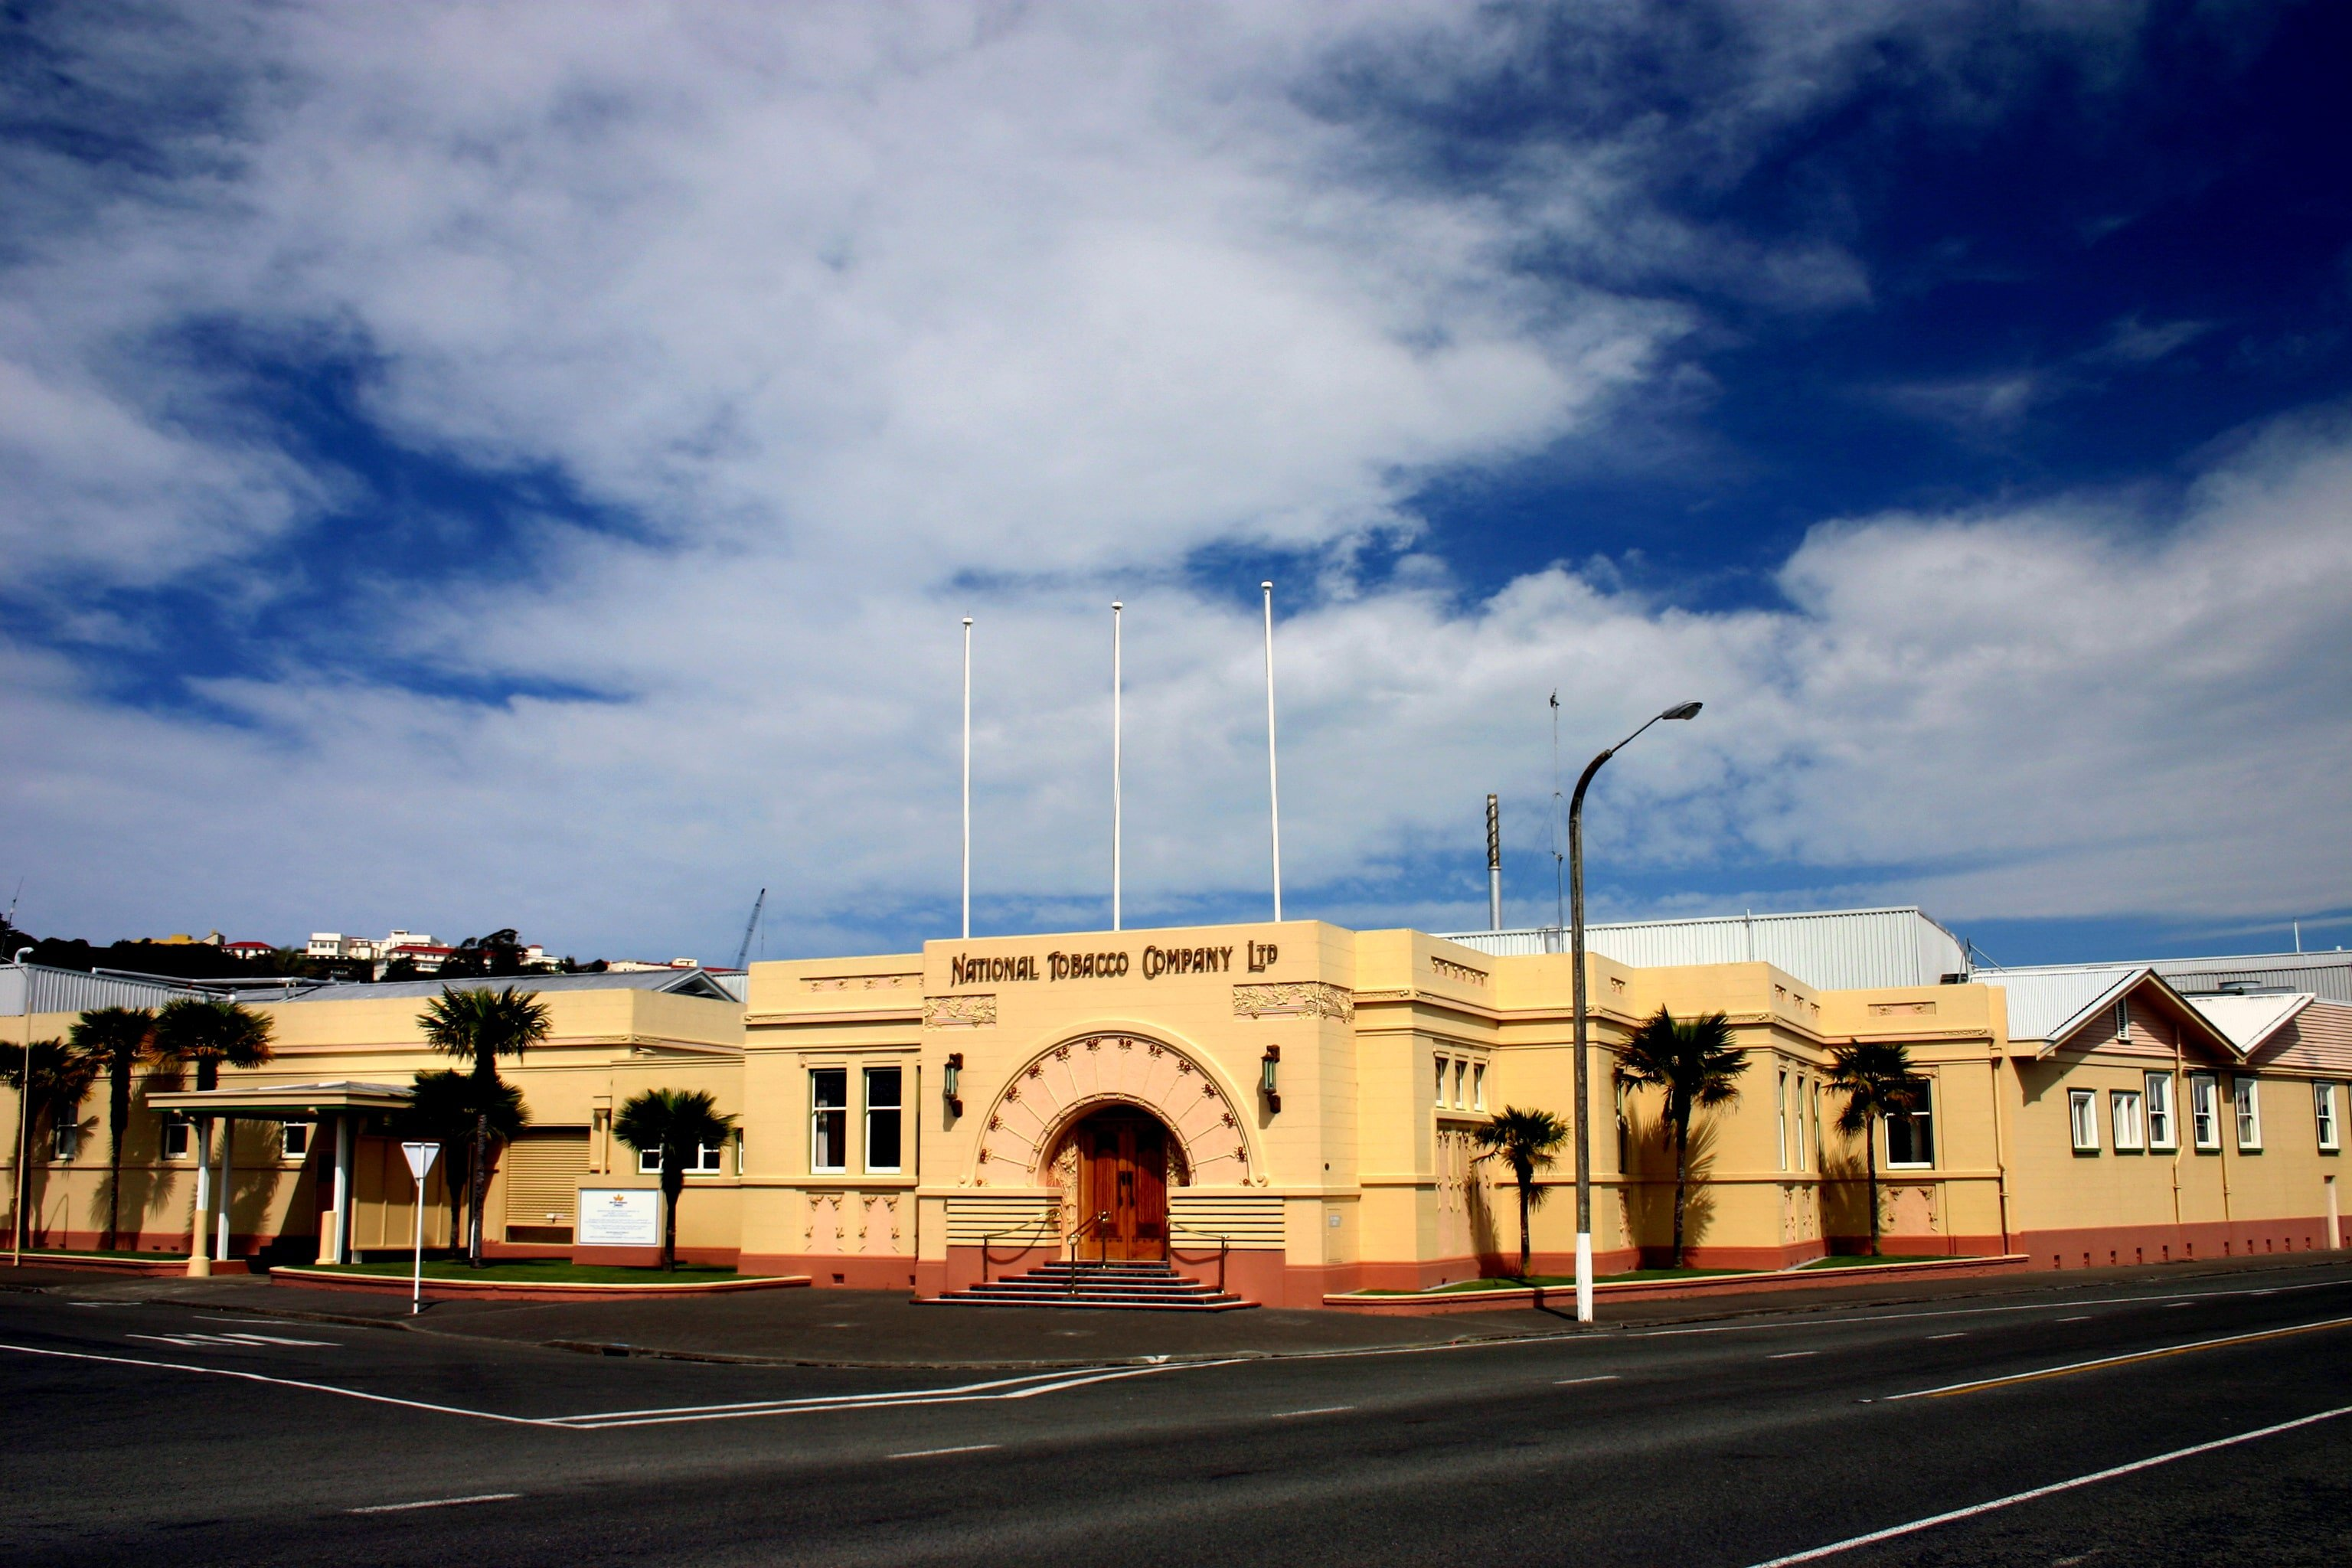 Weit weg Reisen, Napier,National Tobacco Company